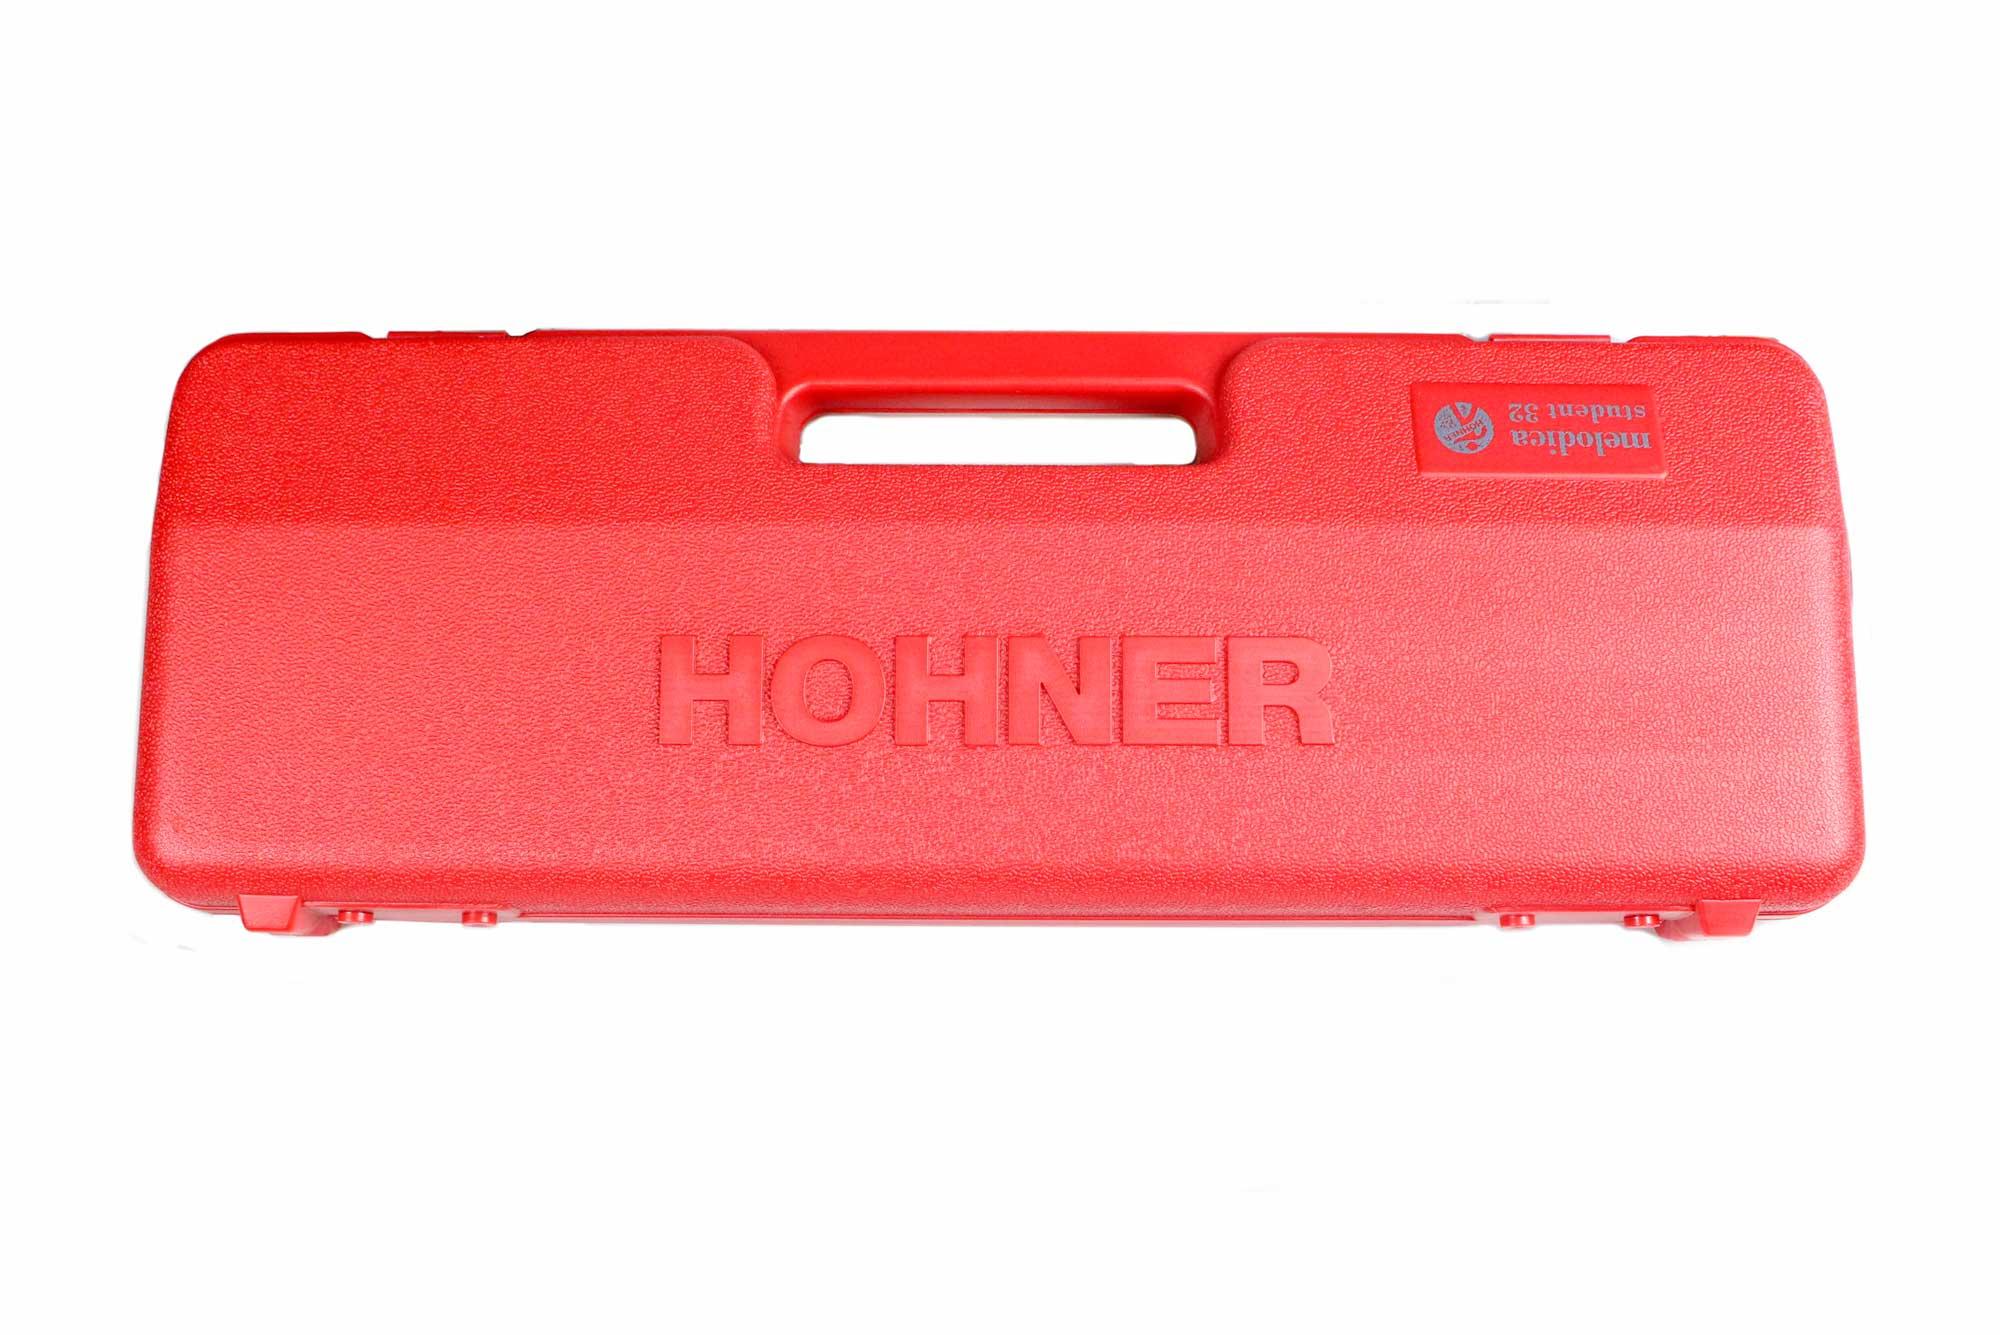 Escaleta melódica 32 teclas F3 - C6 Hohner Student Melódica 32 Red